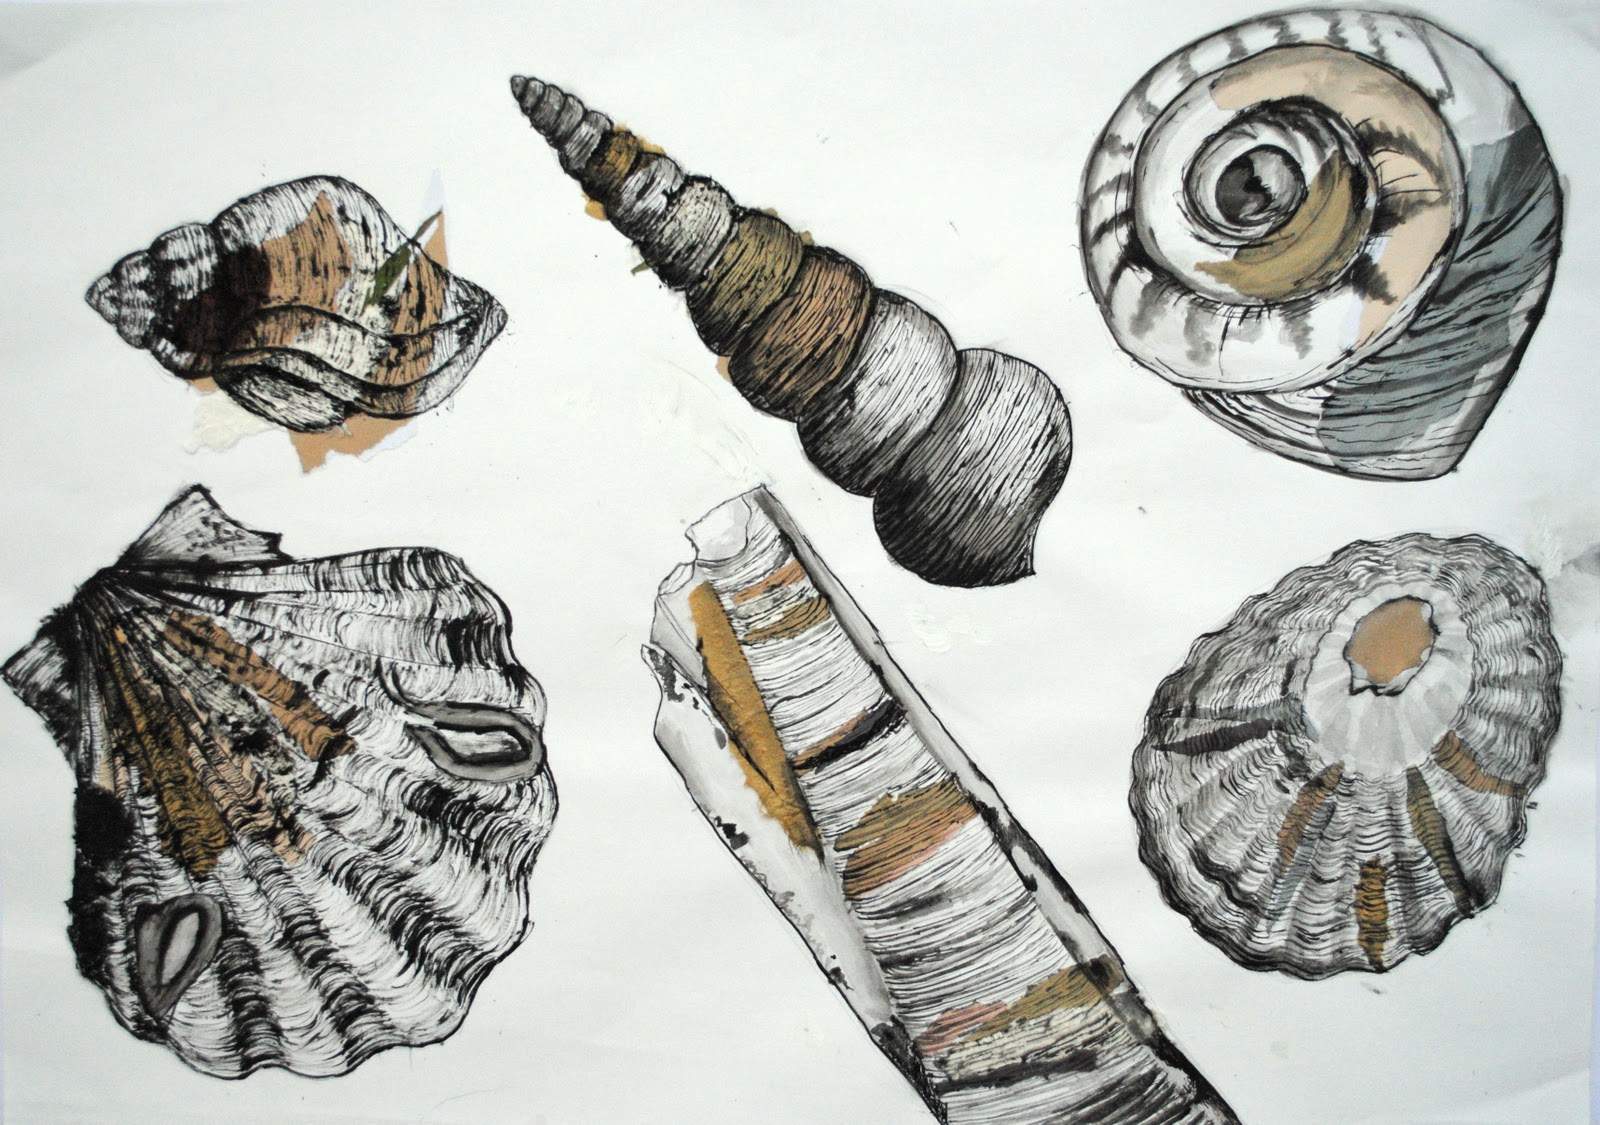 Drawn pen shell Using and shells drawings 1068693634